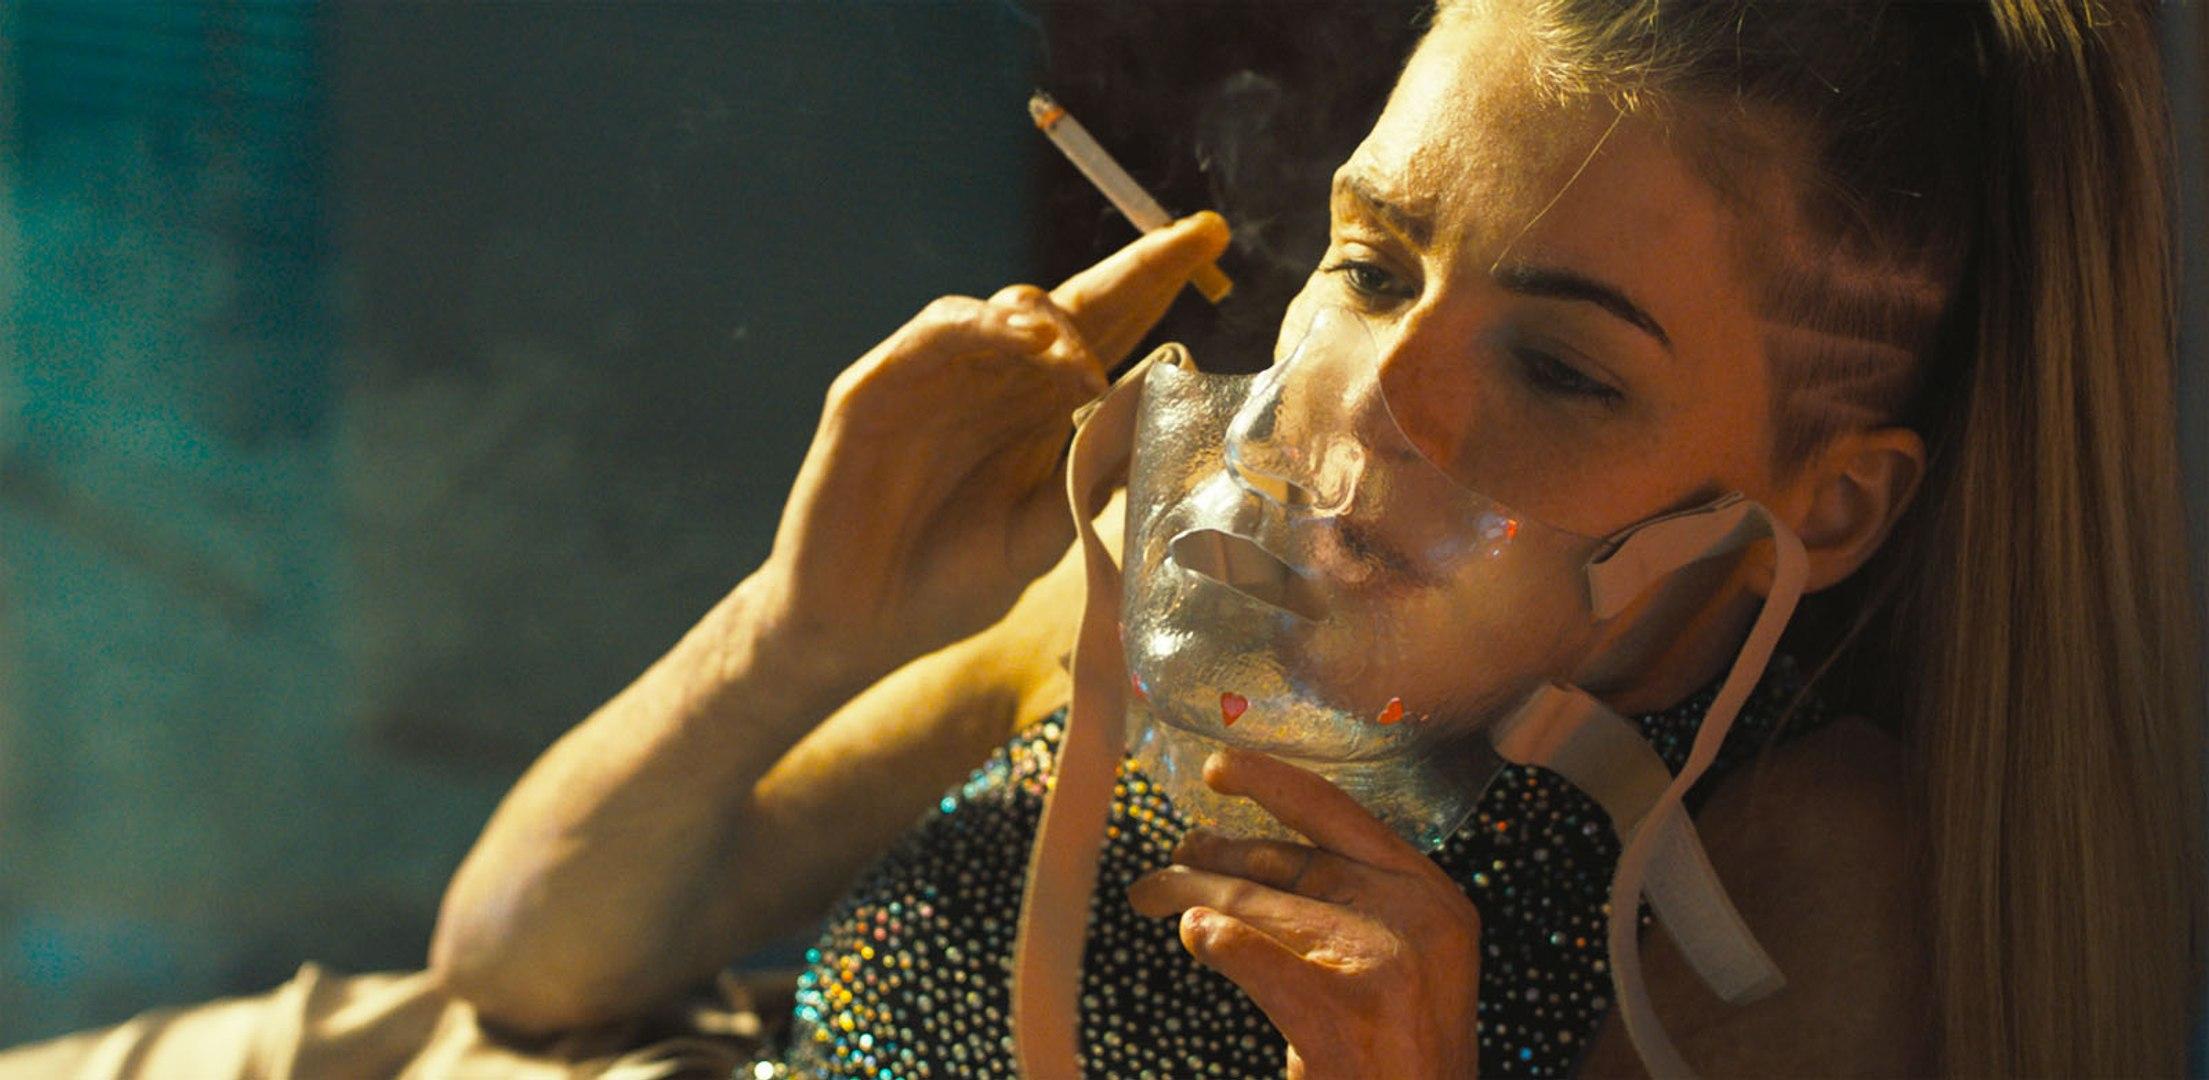 Dirty God Movie - Sacha Polak's acid attack drama - Starring Vicky Knight - Trailer HD